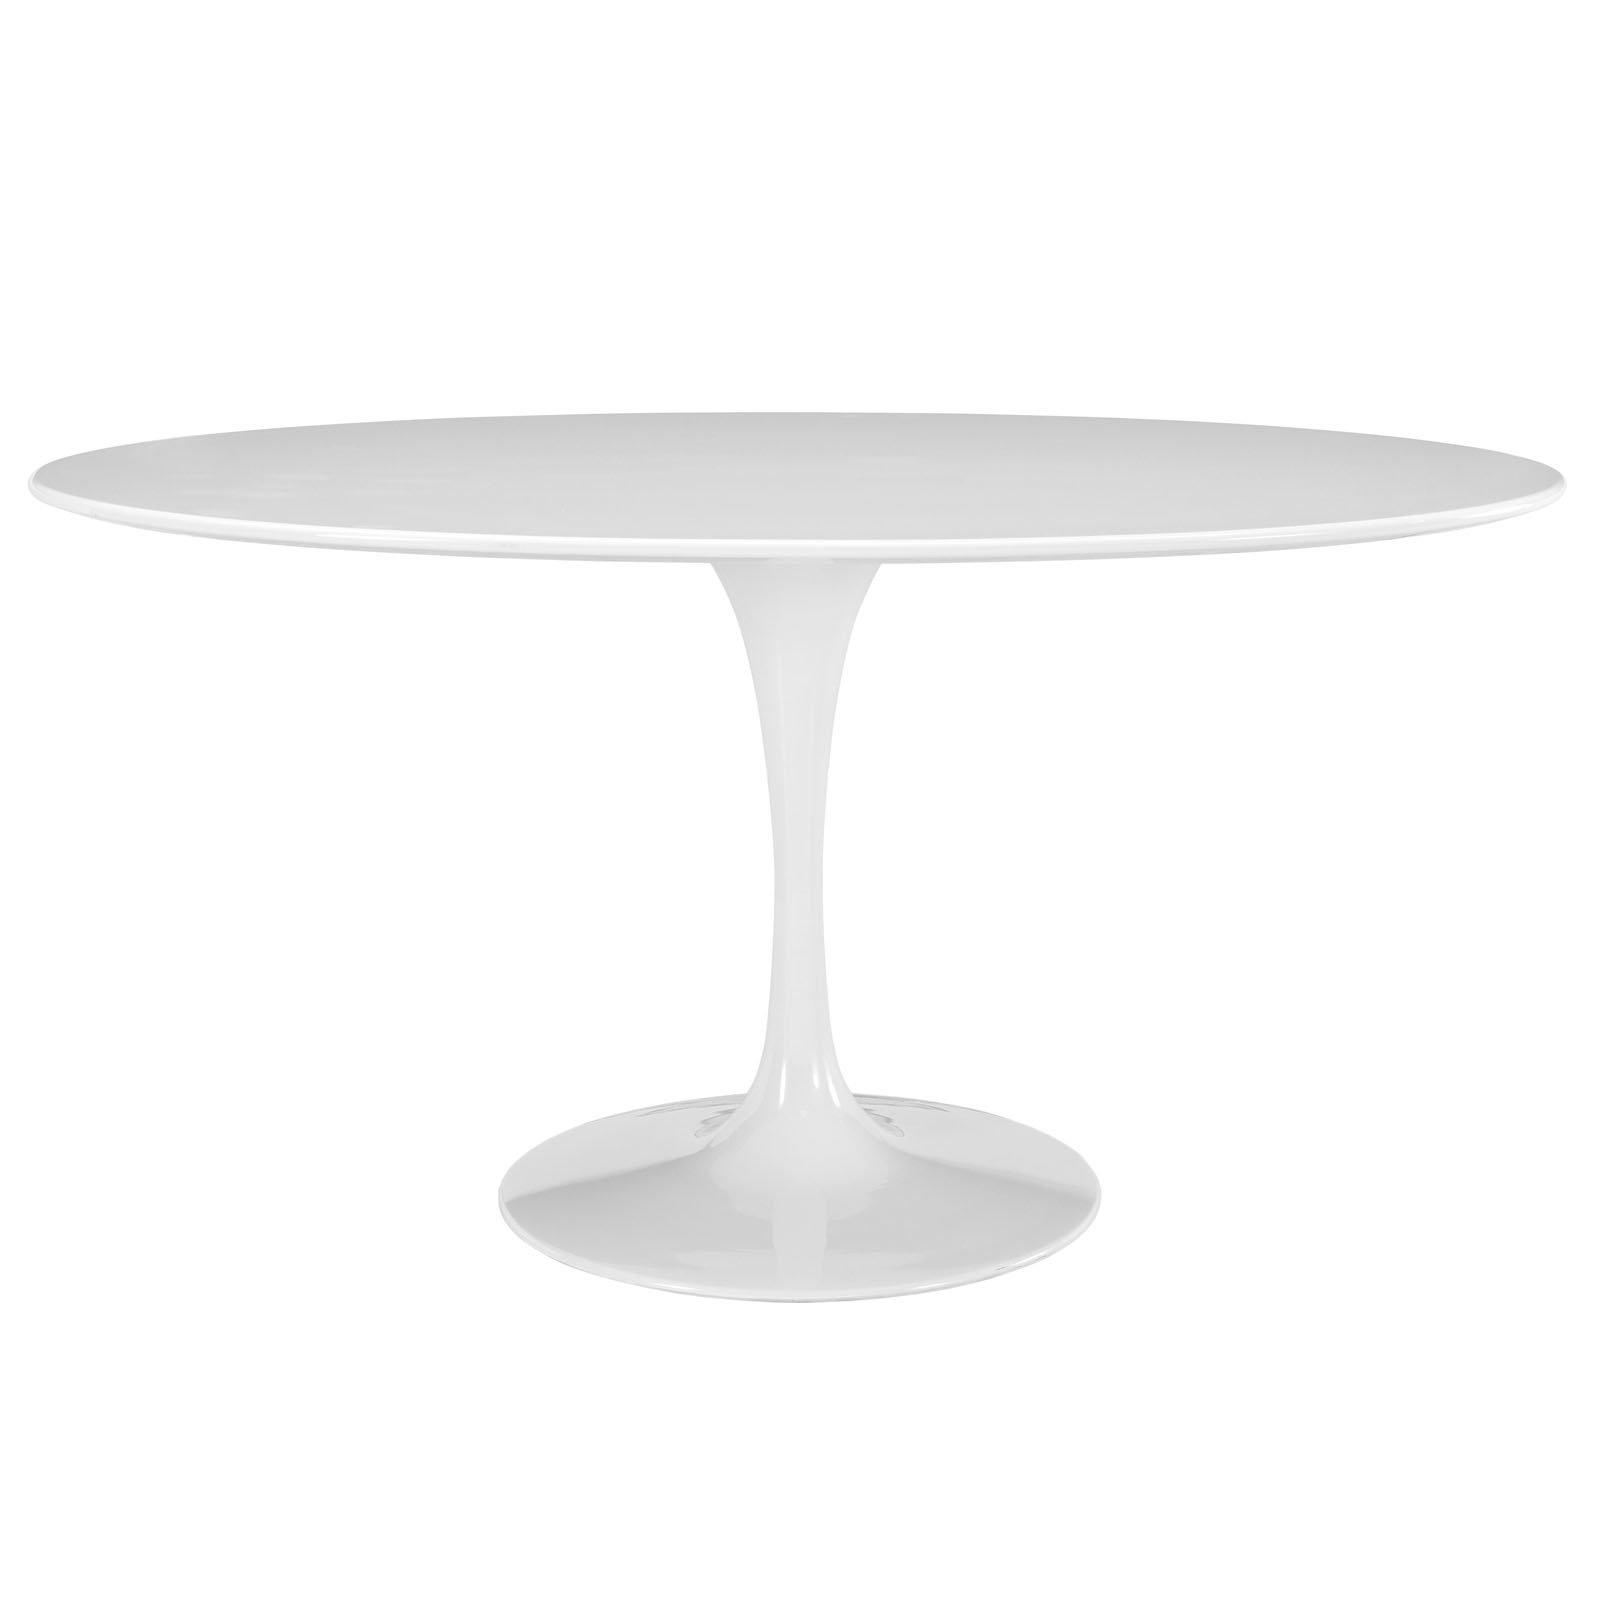 Modway EEI-1121-WHI Lippa Mid-Century Modern 60'' Oval Dining Table, White Base